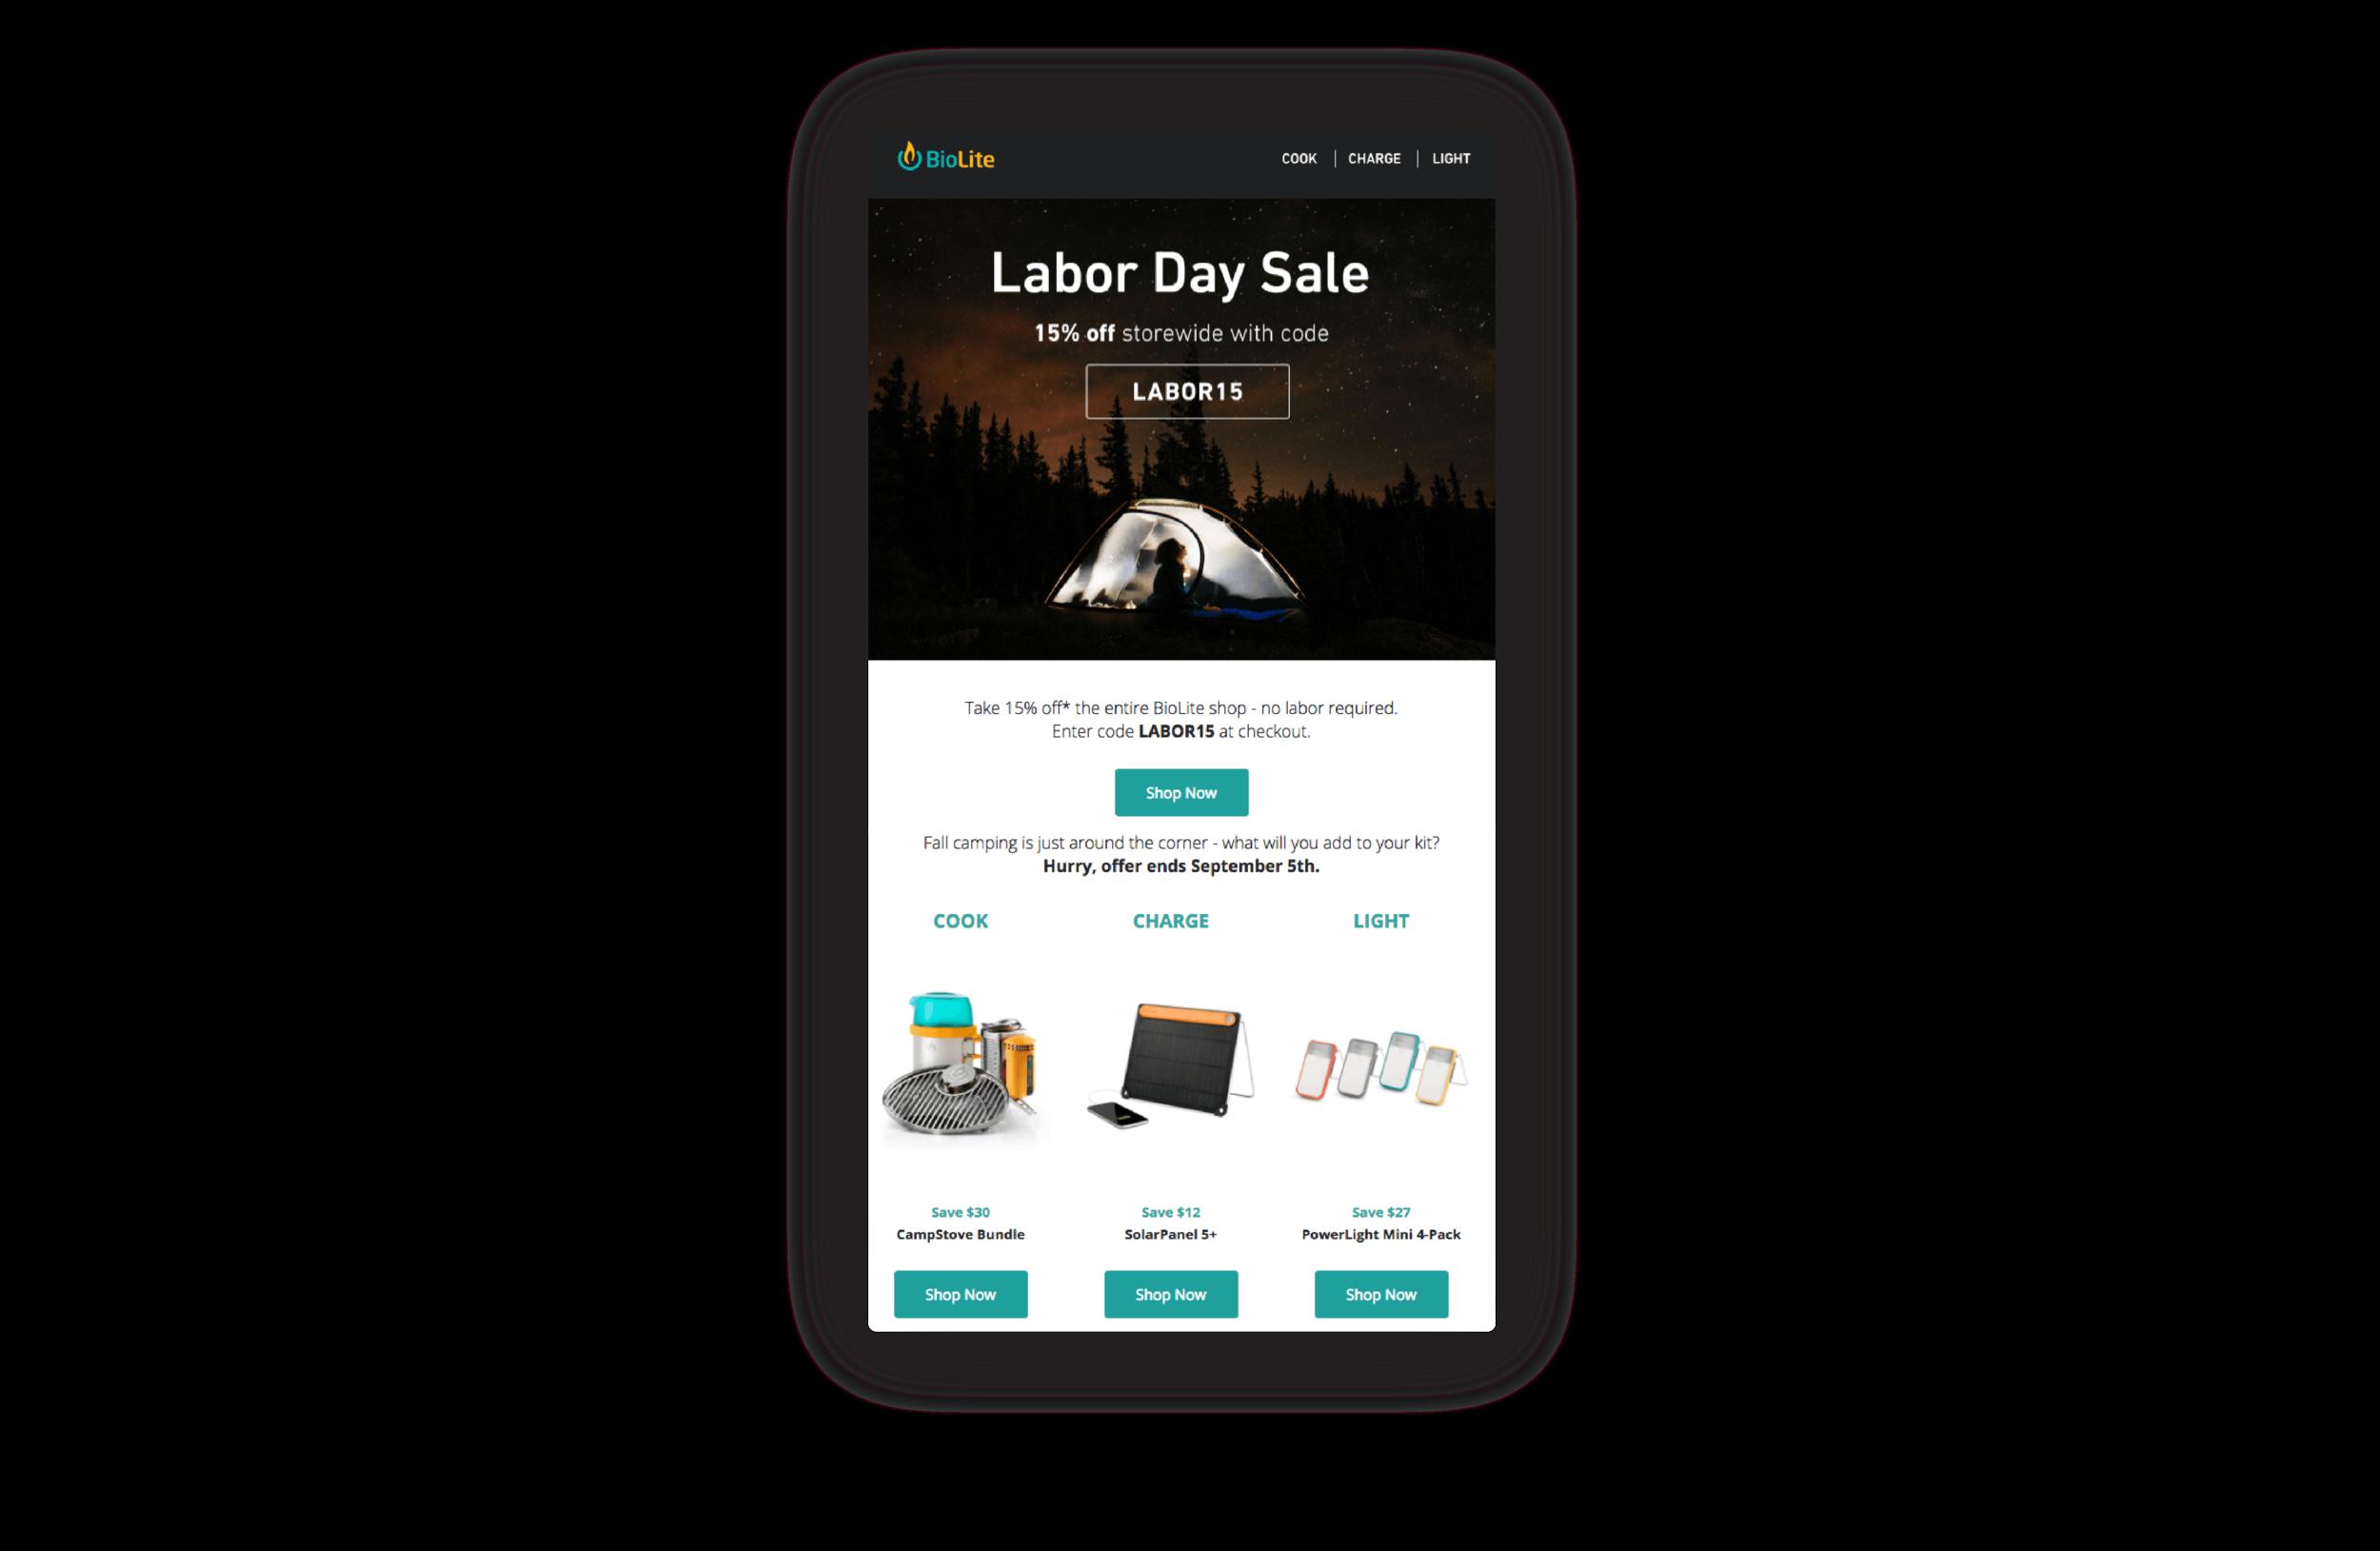 BioLite's Labour Day Sale announcement banner on their website marketing 15% off.